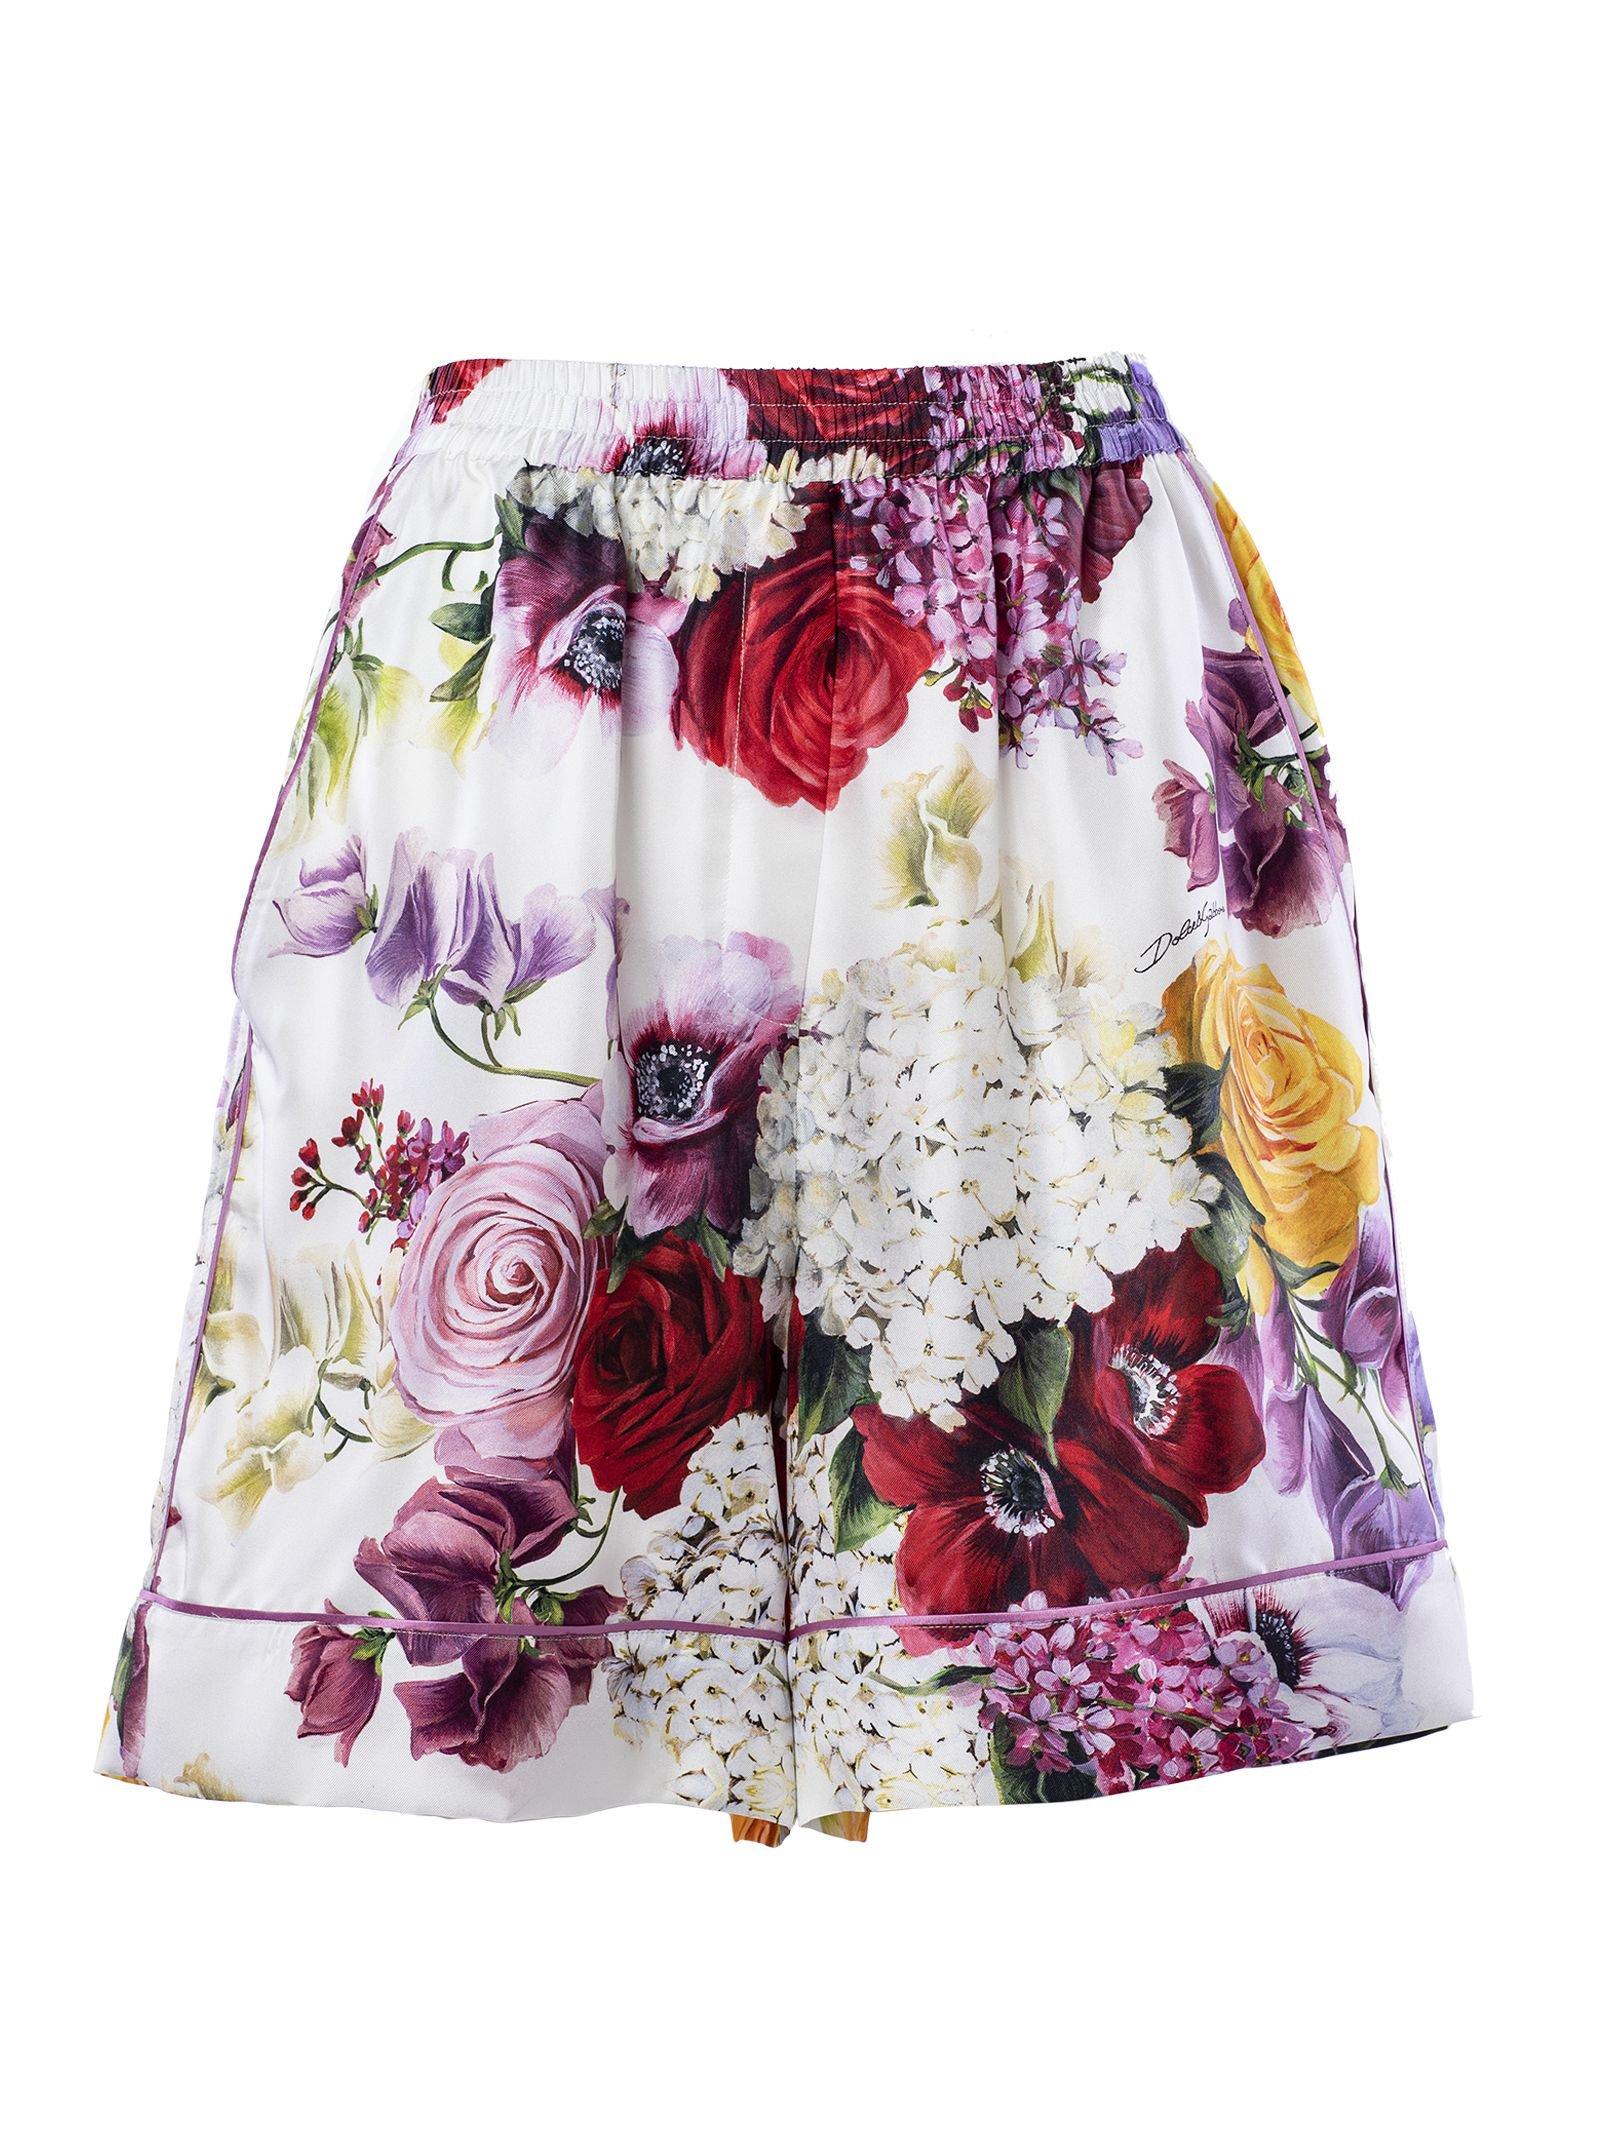 Dolce & Gabbana Floral Print Shorts